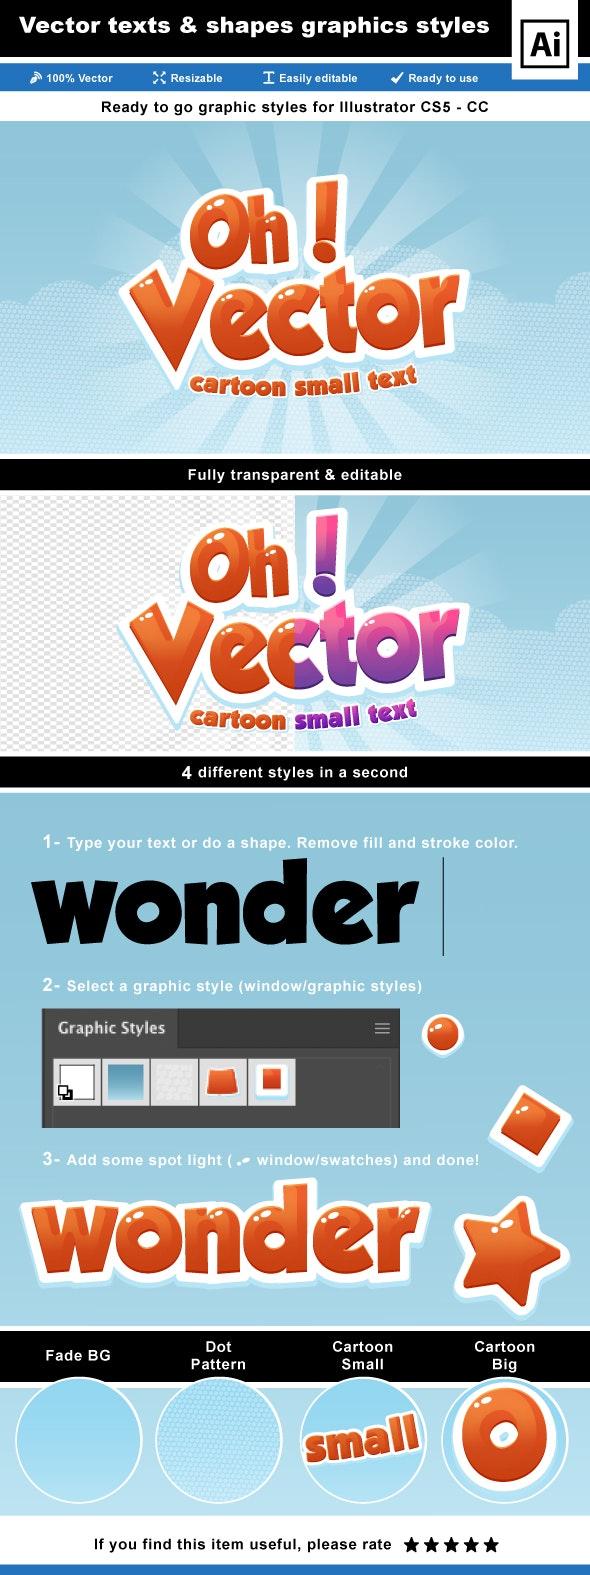 Cartoon Text Effects for Illustrator - Styles Illustrator